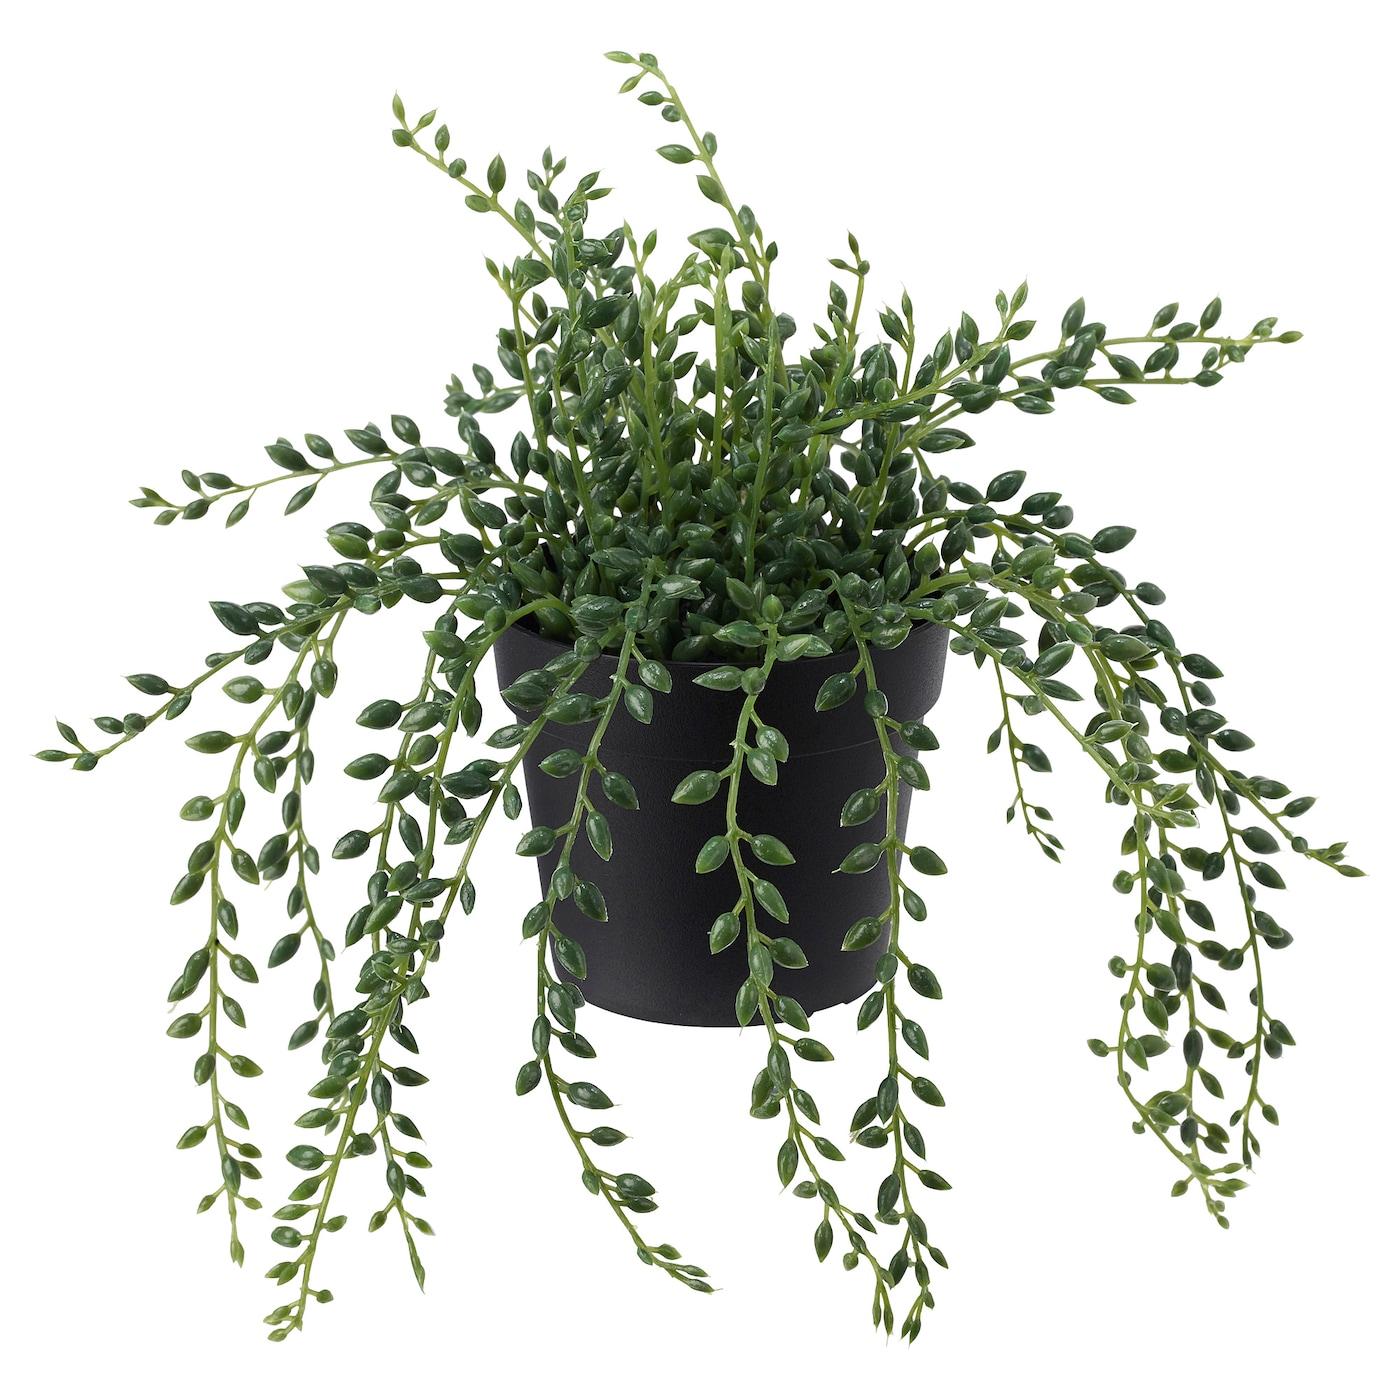 FEJKA フェイカ 人工観葉植物